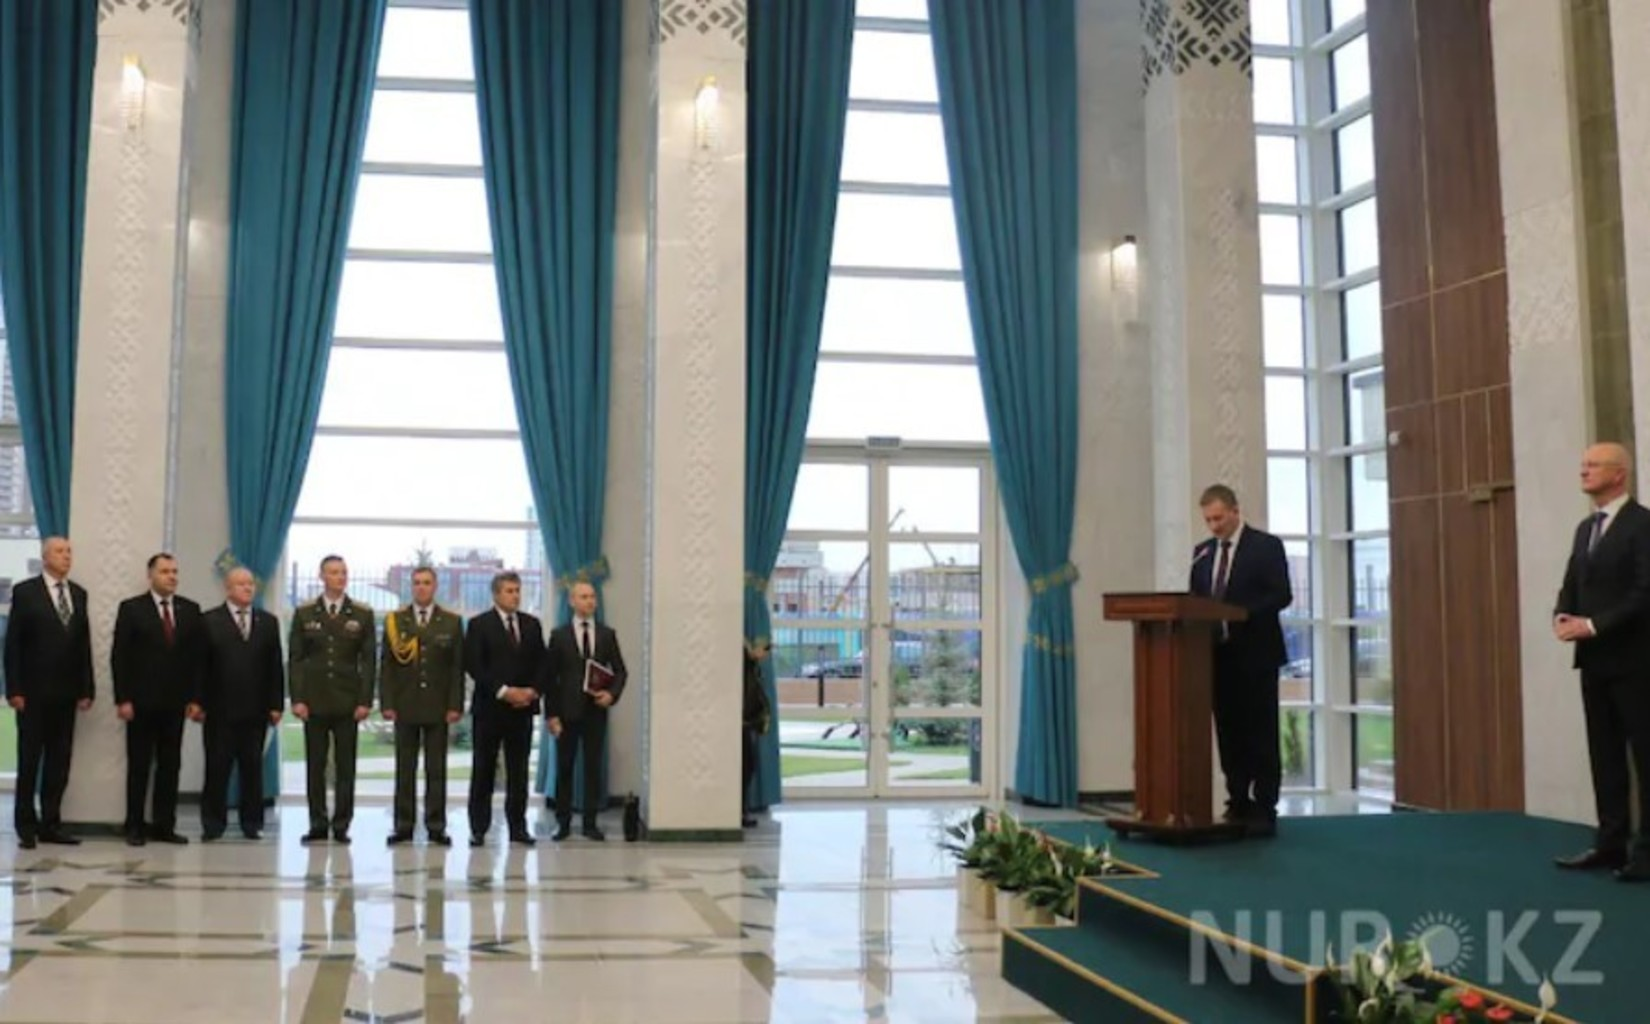 Posolstvo belarusi v kazakhstane24 2